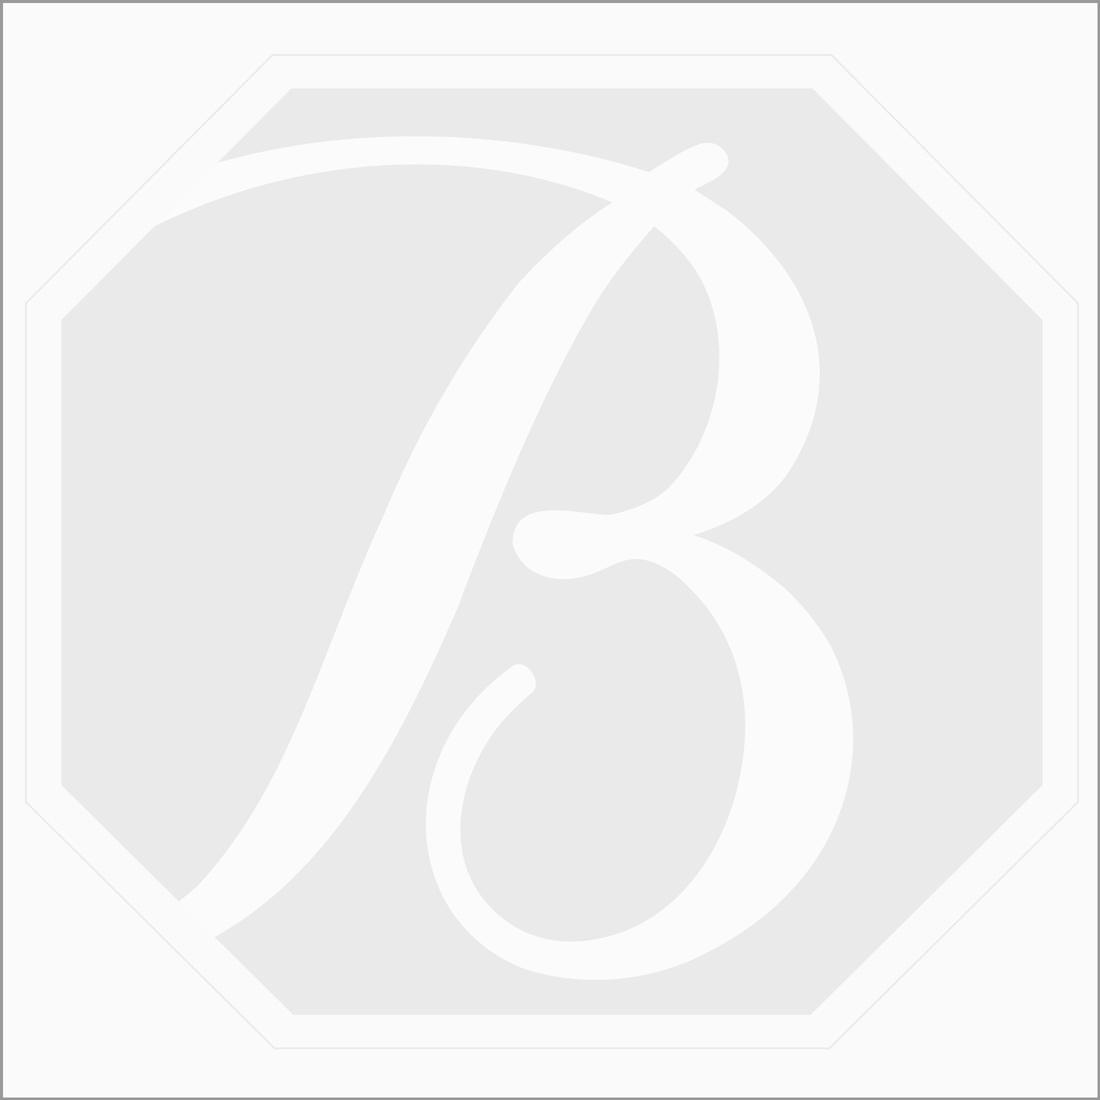 0.58 ct. Oval (I-VVS2) White Rose Cut Diamond Photograph